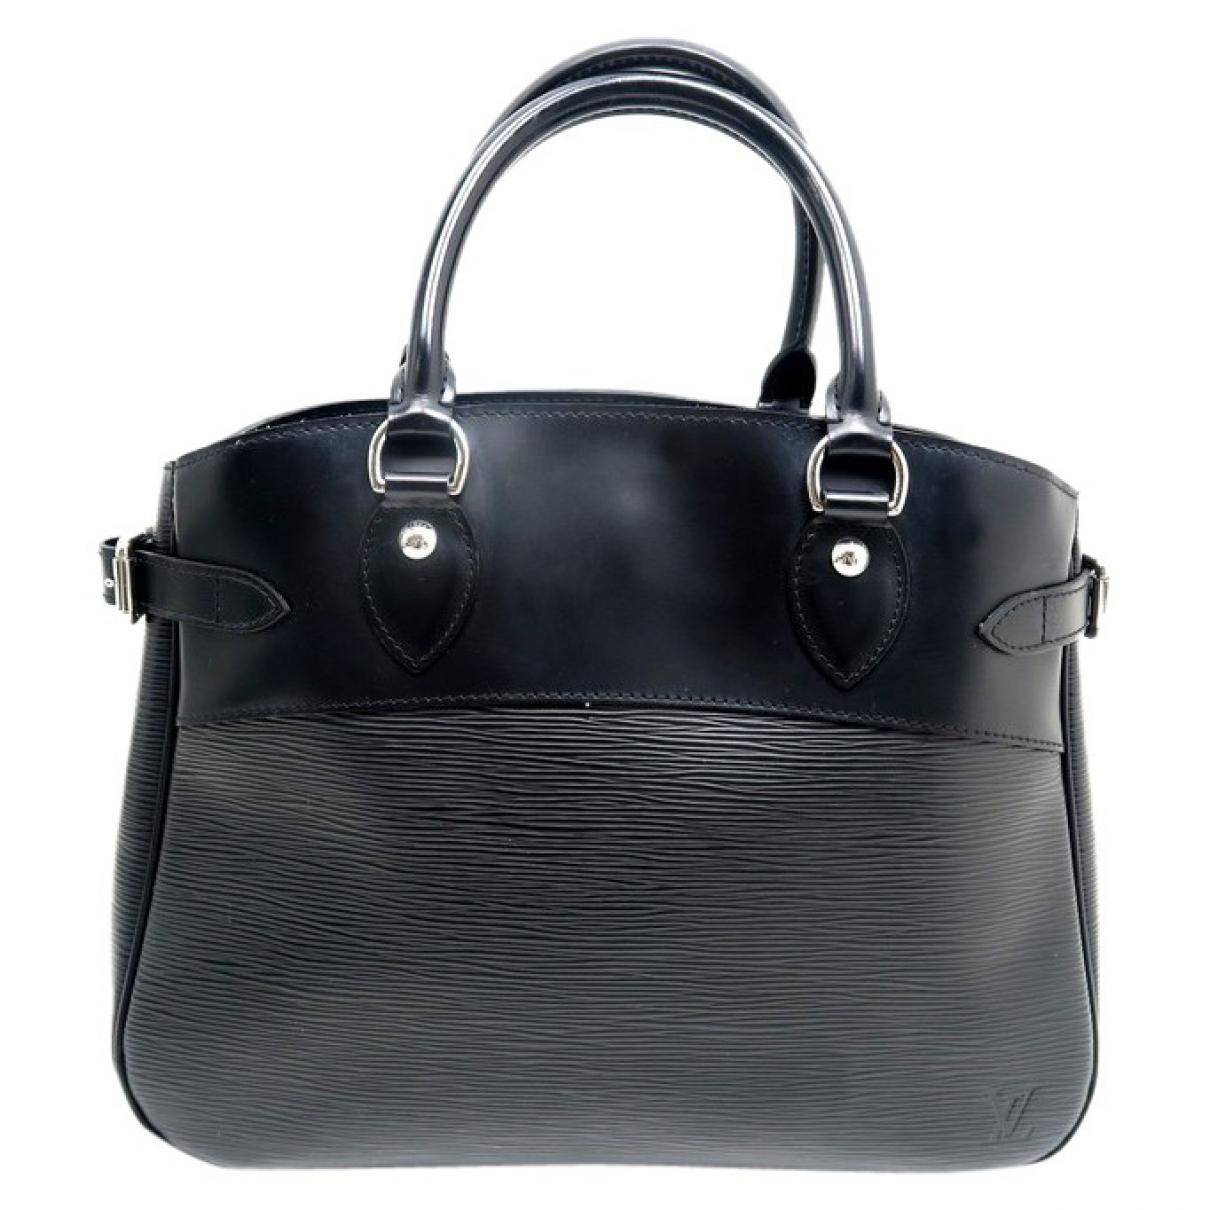 98d9064417c3 Lyst - Louis Vuitton Pre-owned Leather Handbag in Black